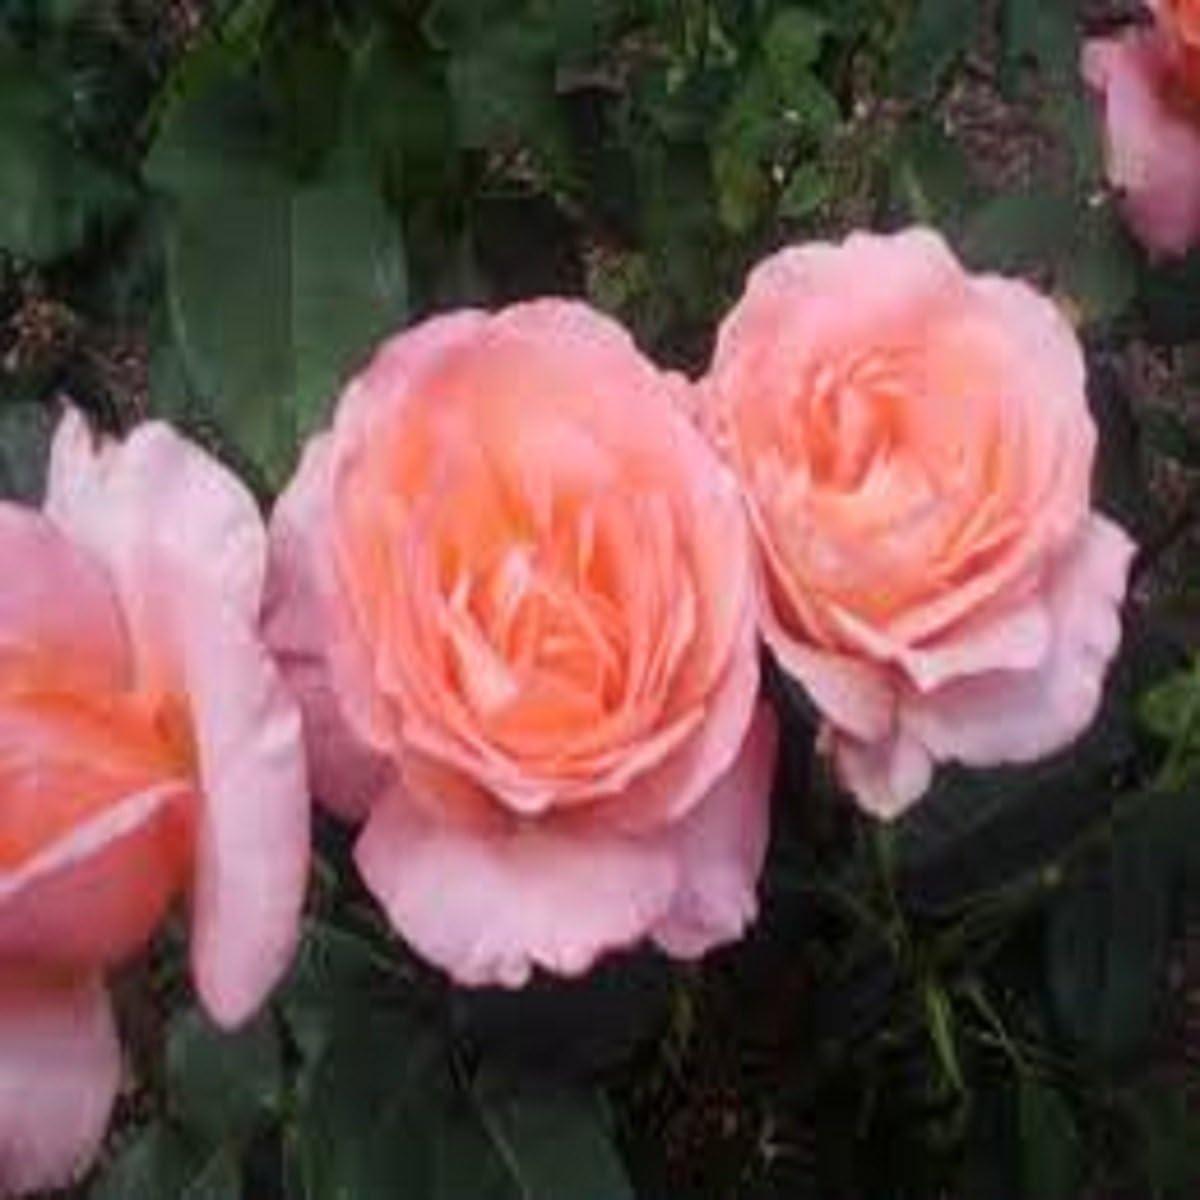 Patchouli Rose Fragrance Popular popular Oil - 16 OZ LB Fees free for SOAP 1 Candle M